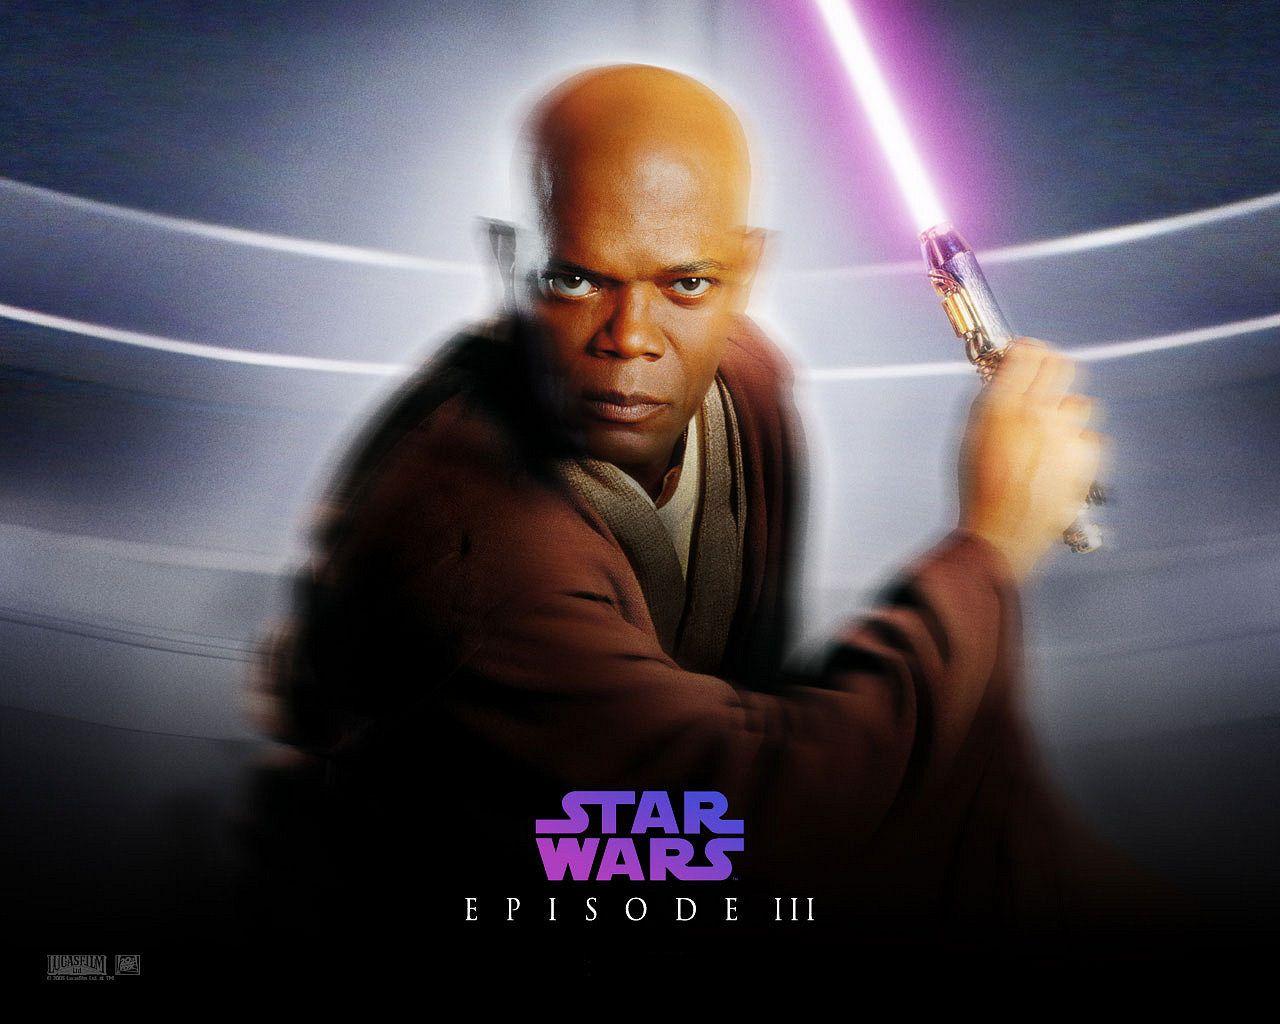 Mace Windu Star Wars Awesome Star Wars Episodes Star Wars Poster